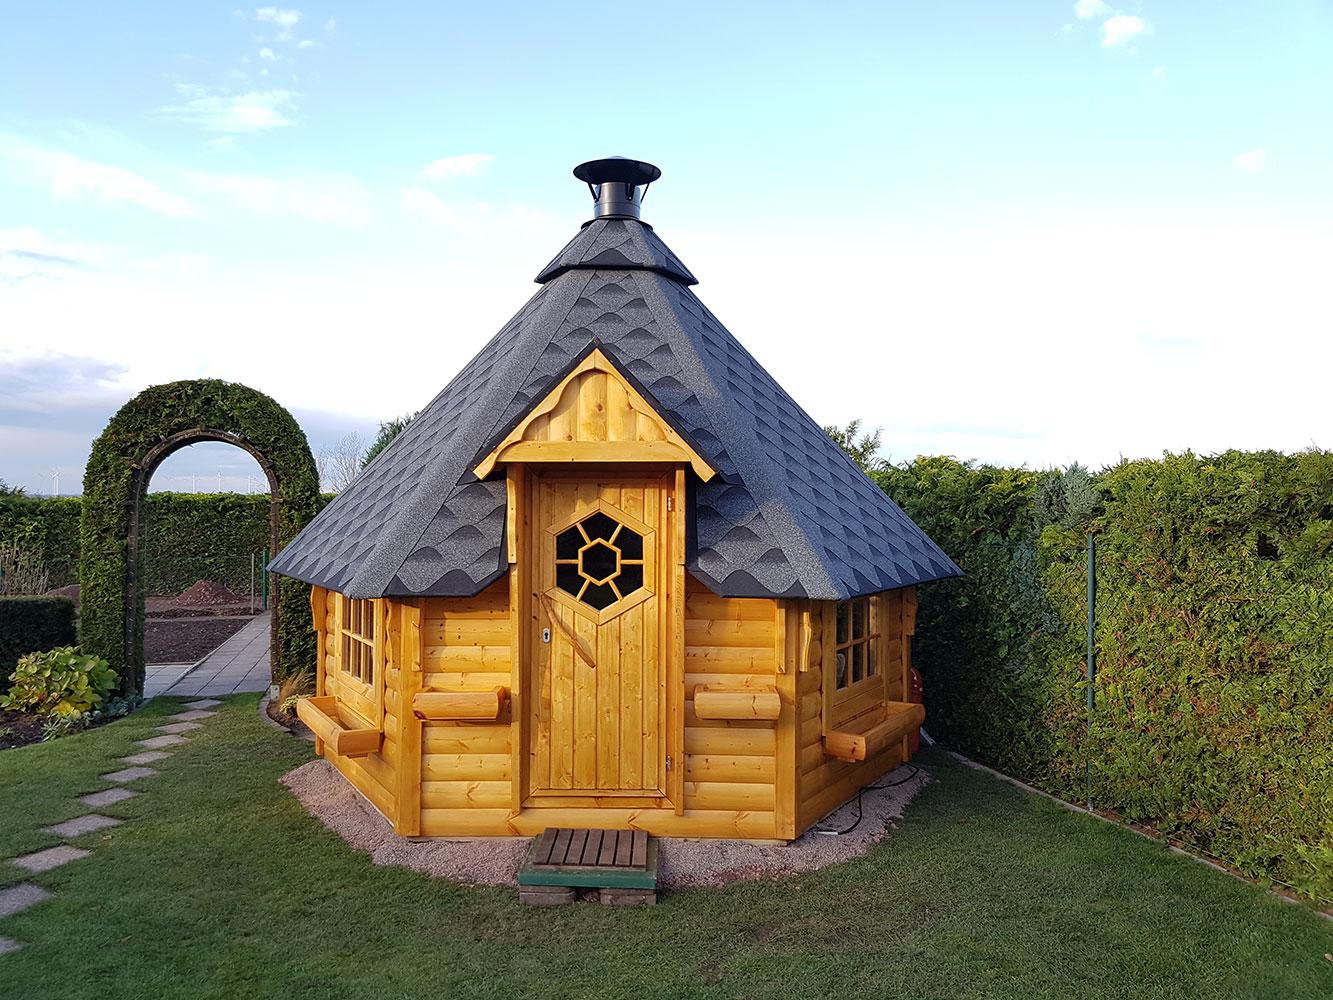 grillhütte / kota 9,2 m² - scandinavic wood art